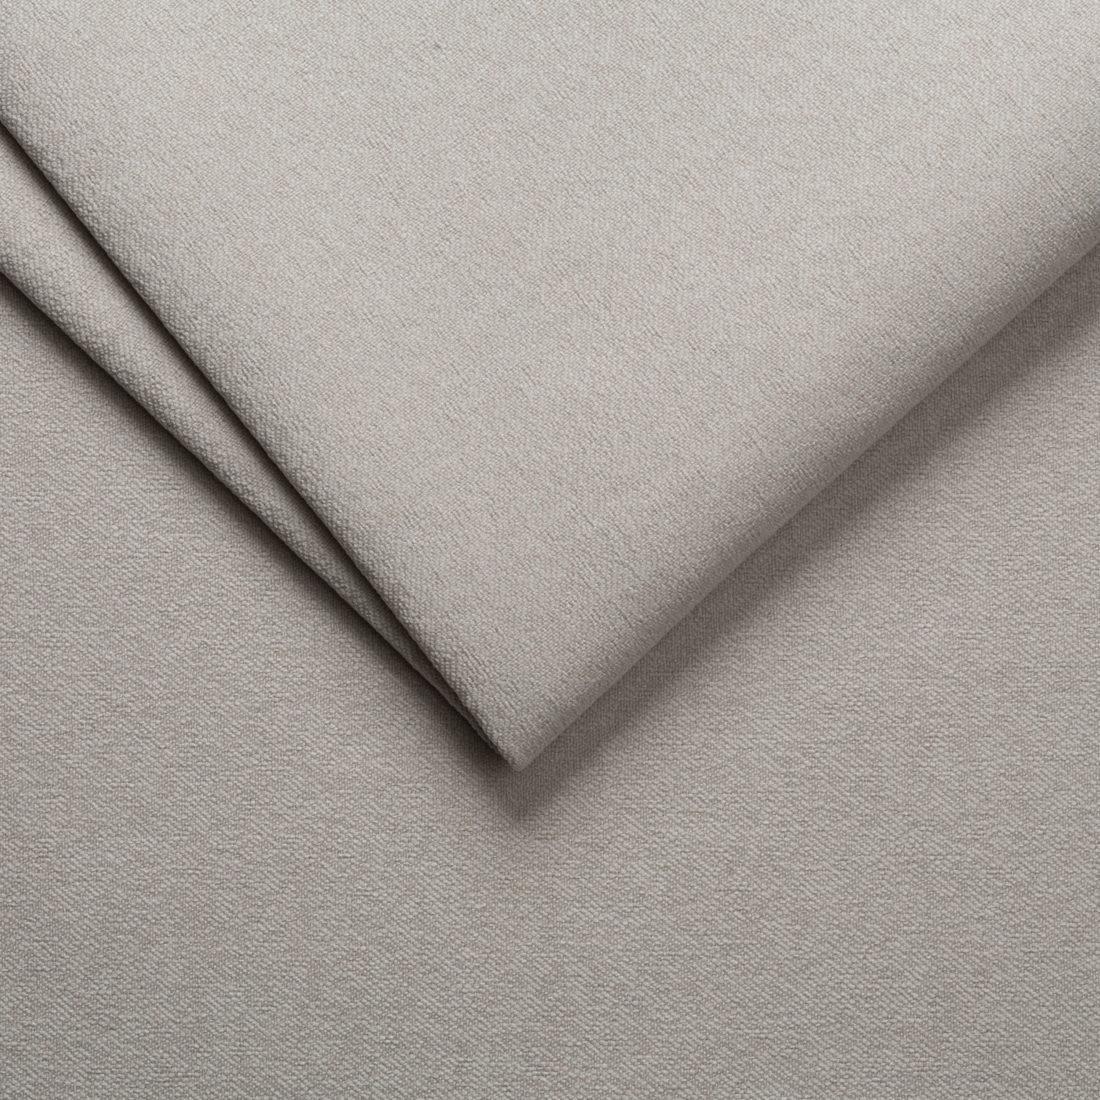 Мебельная ткань Evolution 1 Linen, жаккард